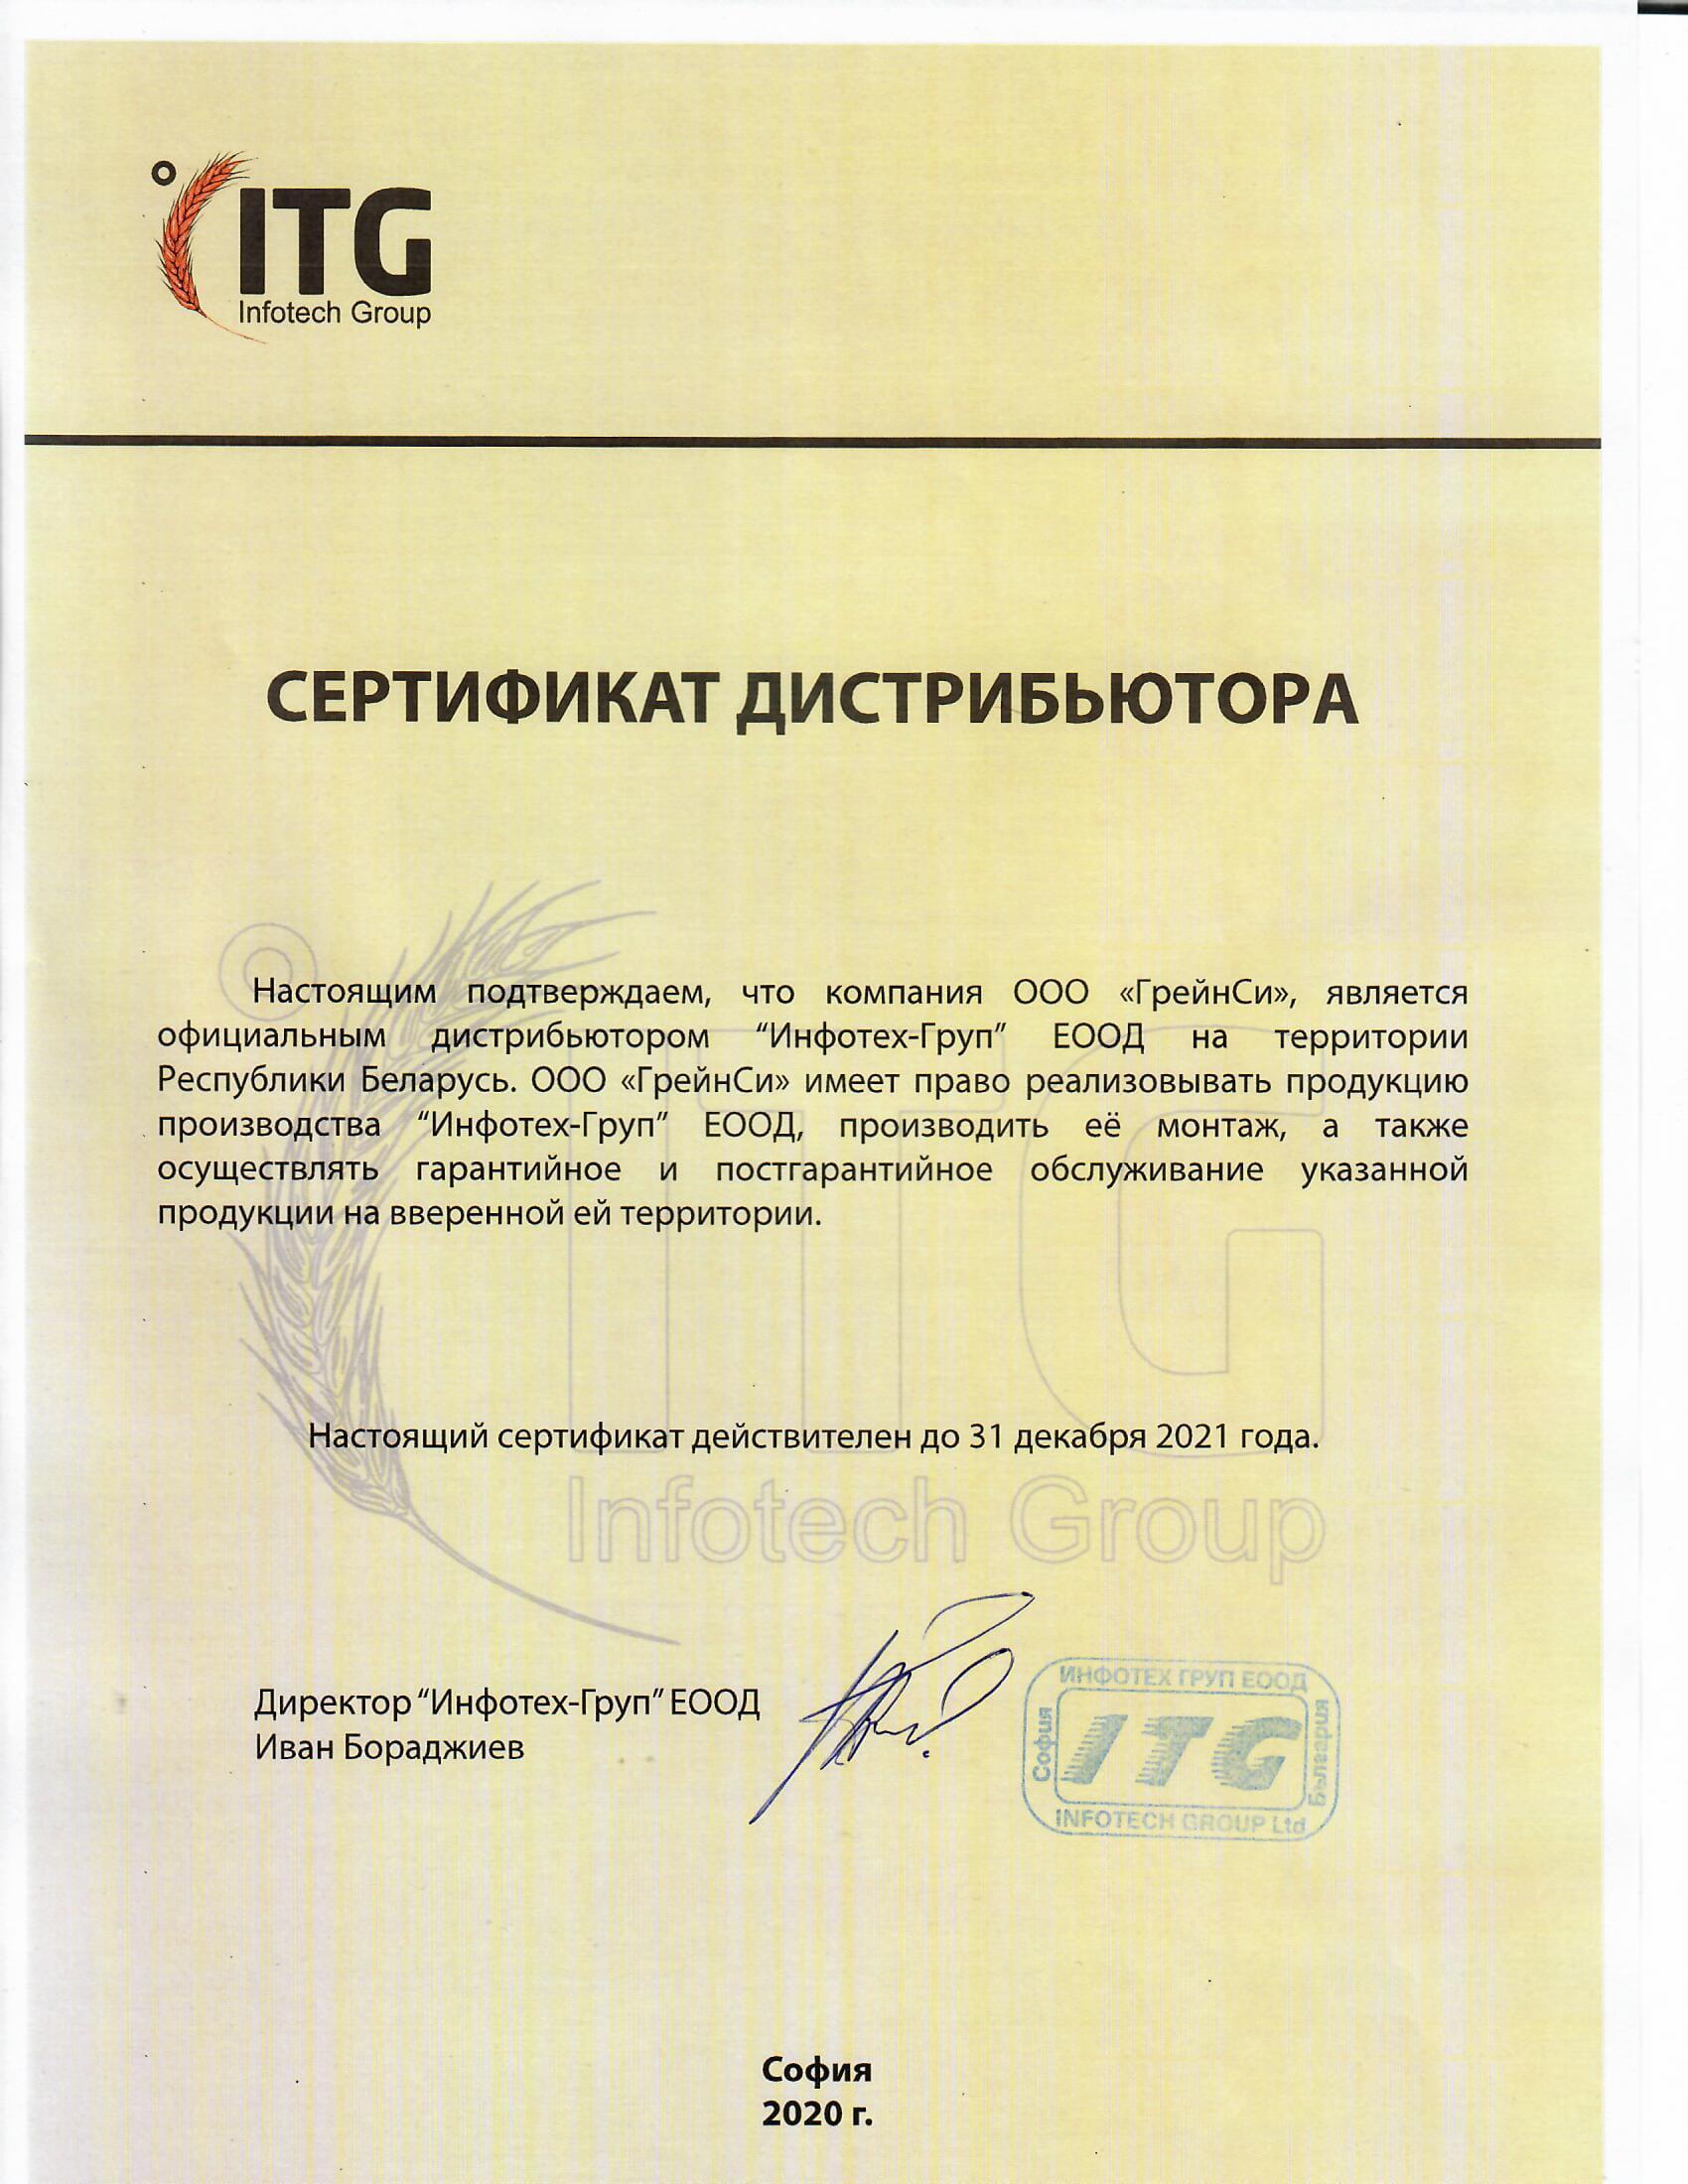 Сертификат Дистрибьютъра ГрейнСи ООО-1